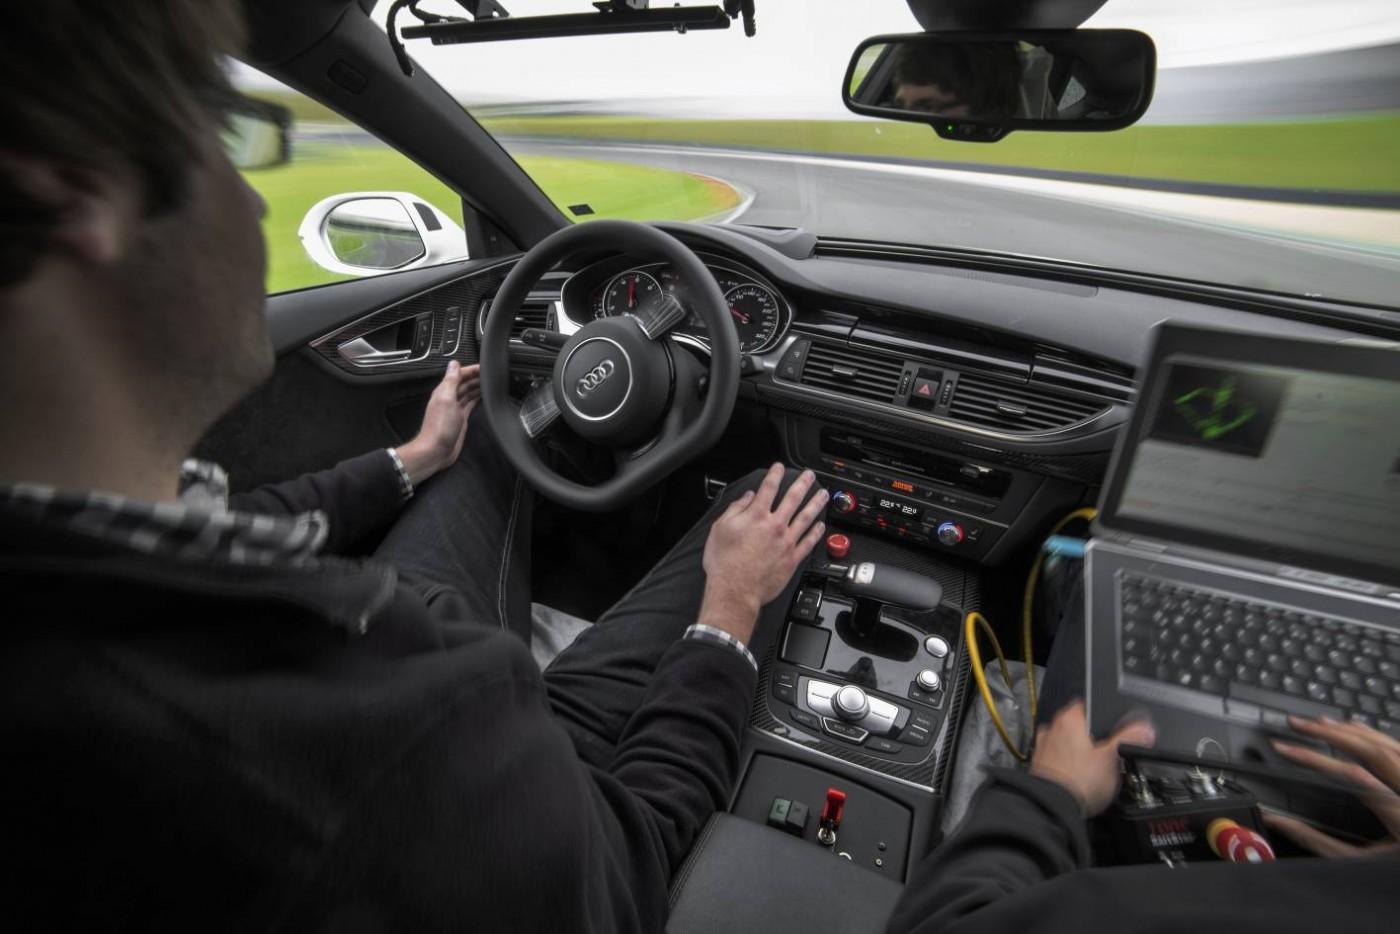 Driverless Audi A In Report Practical Motoring - Audi driverless car